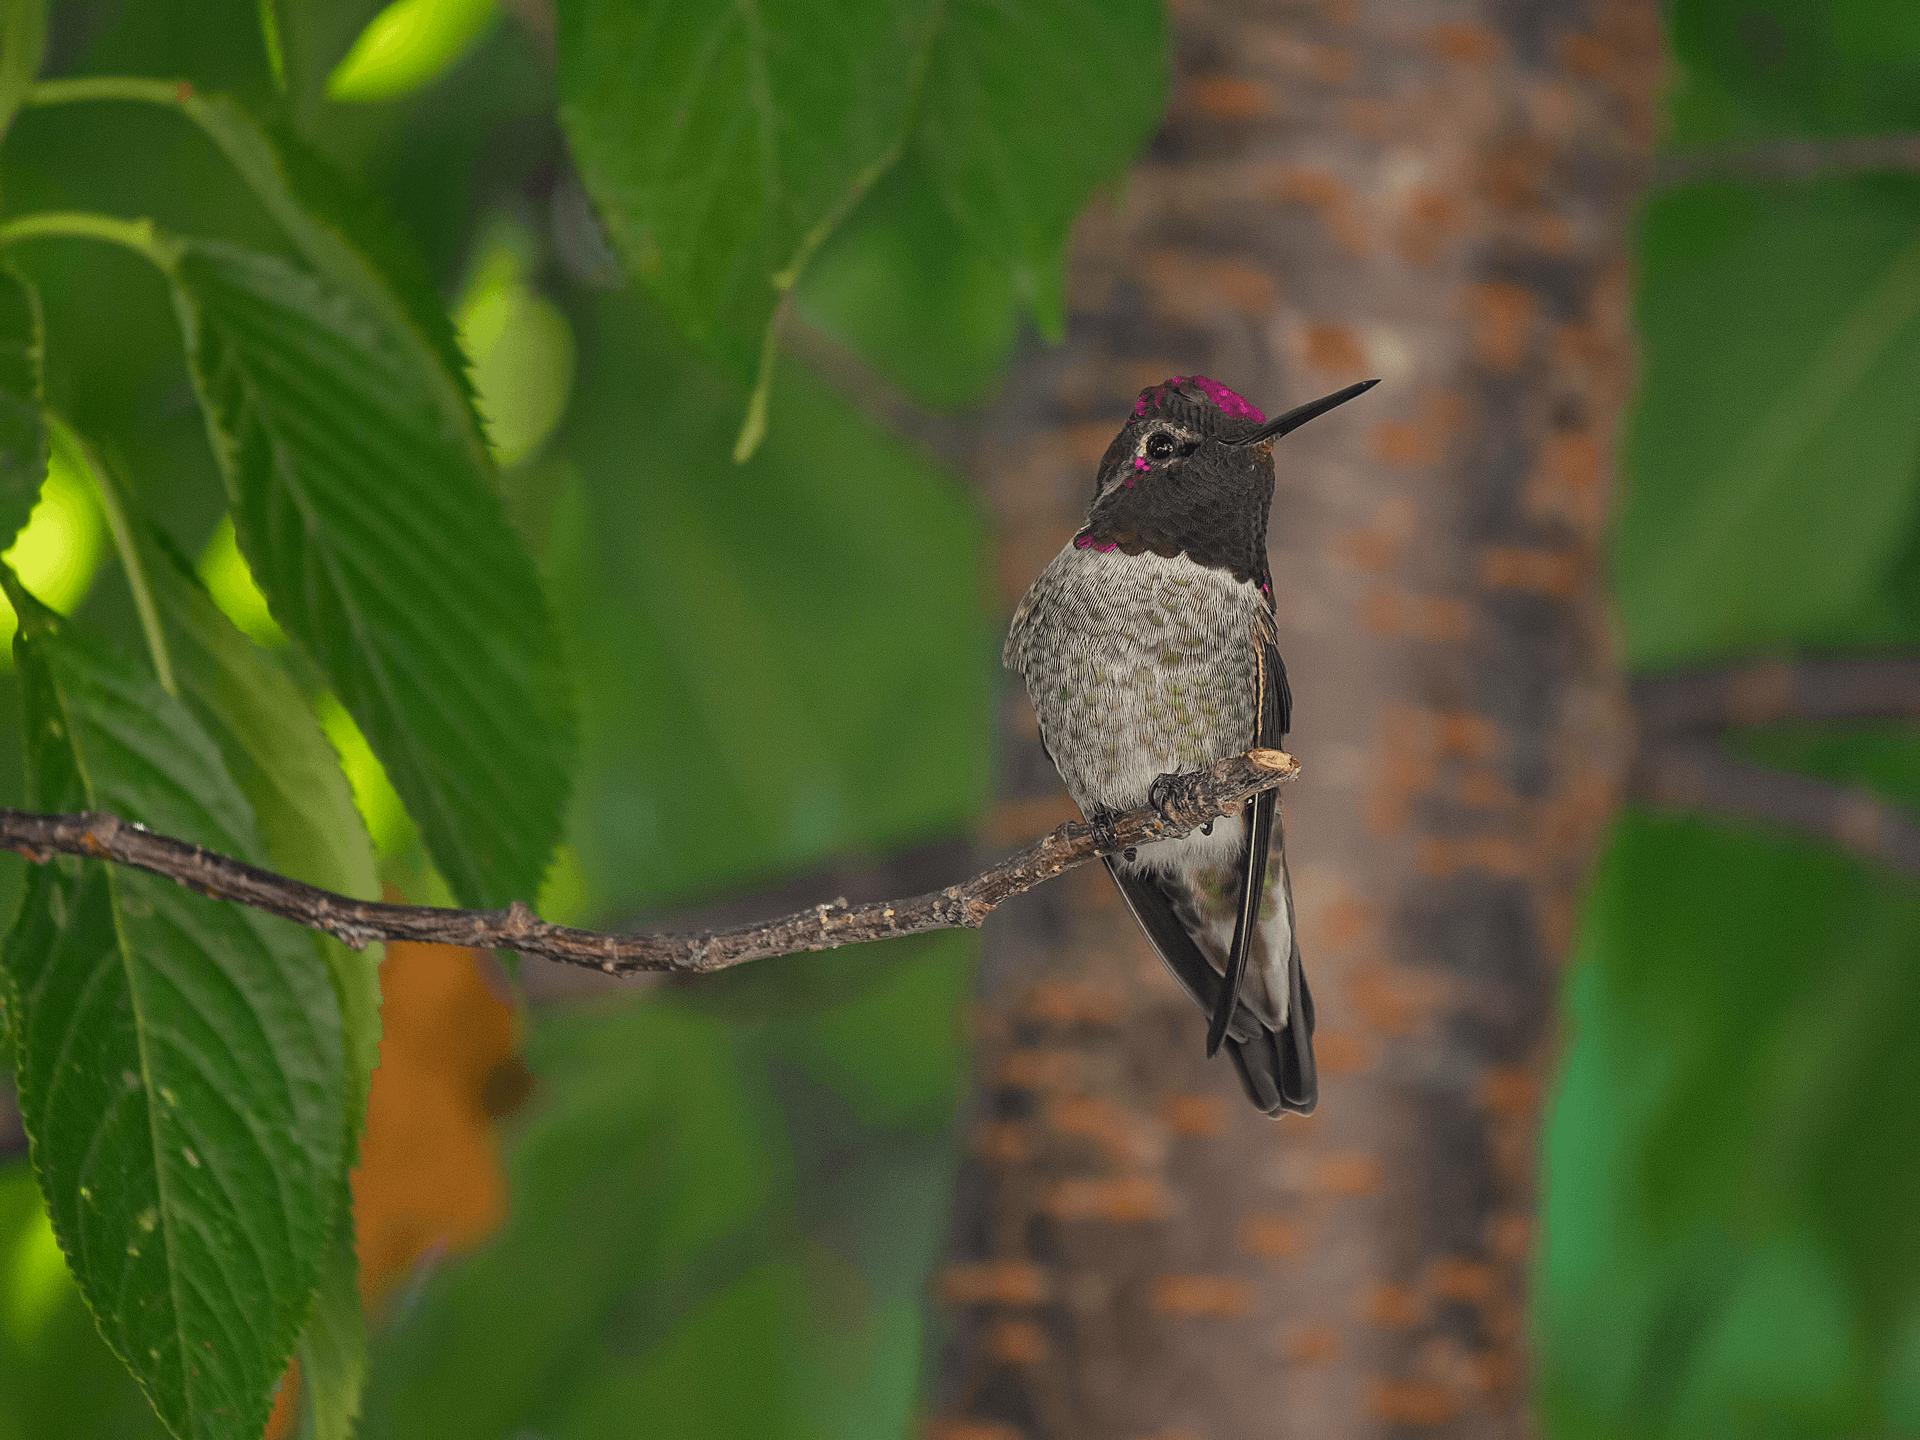 Hummingbird nesting near tree